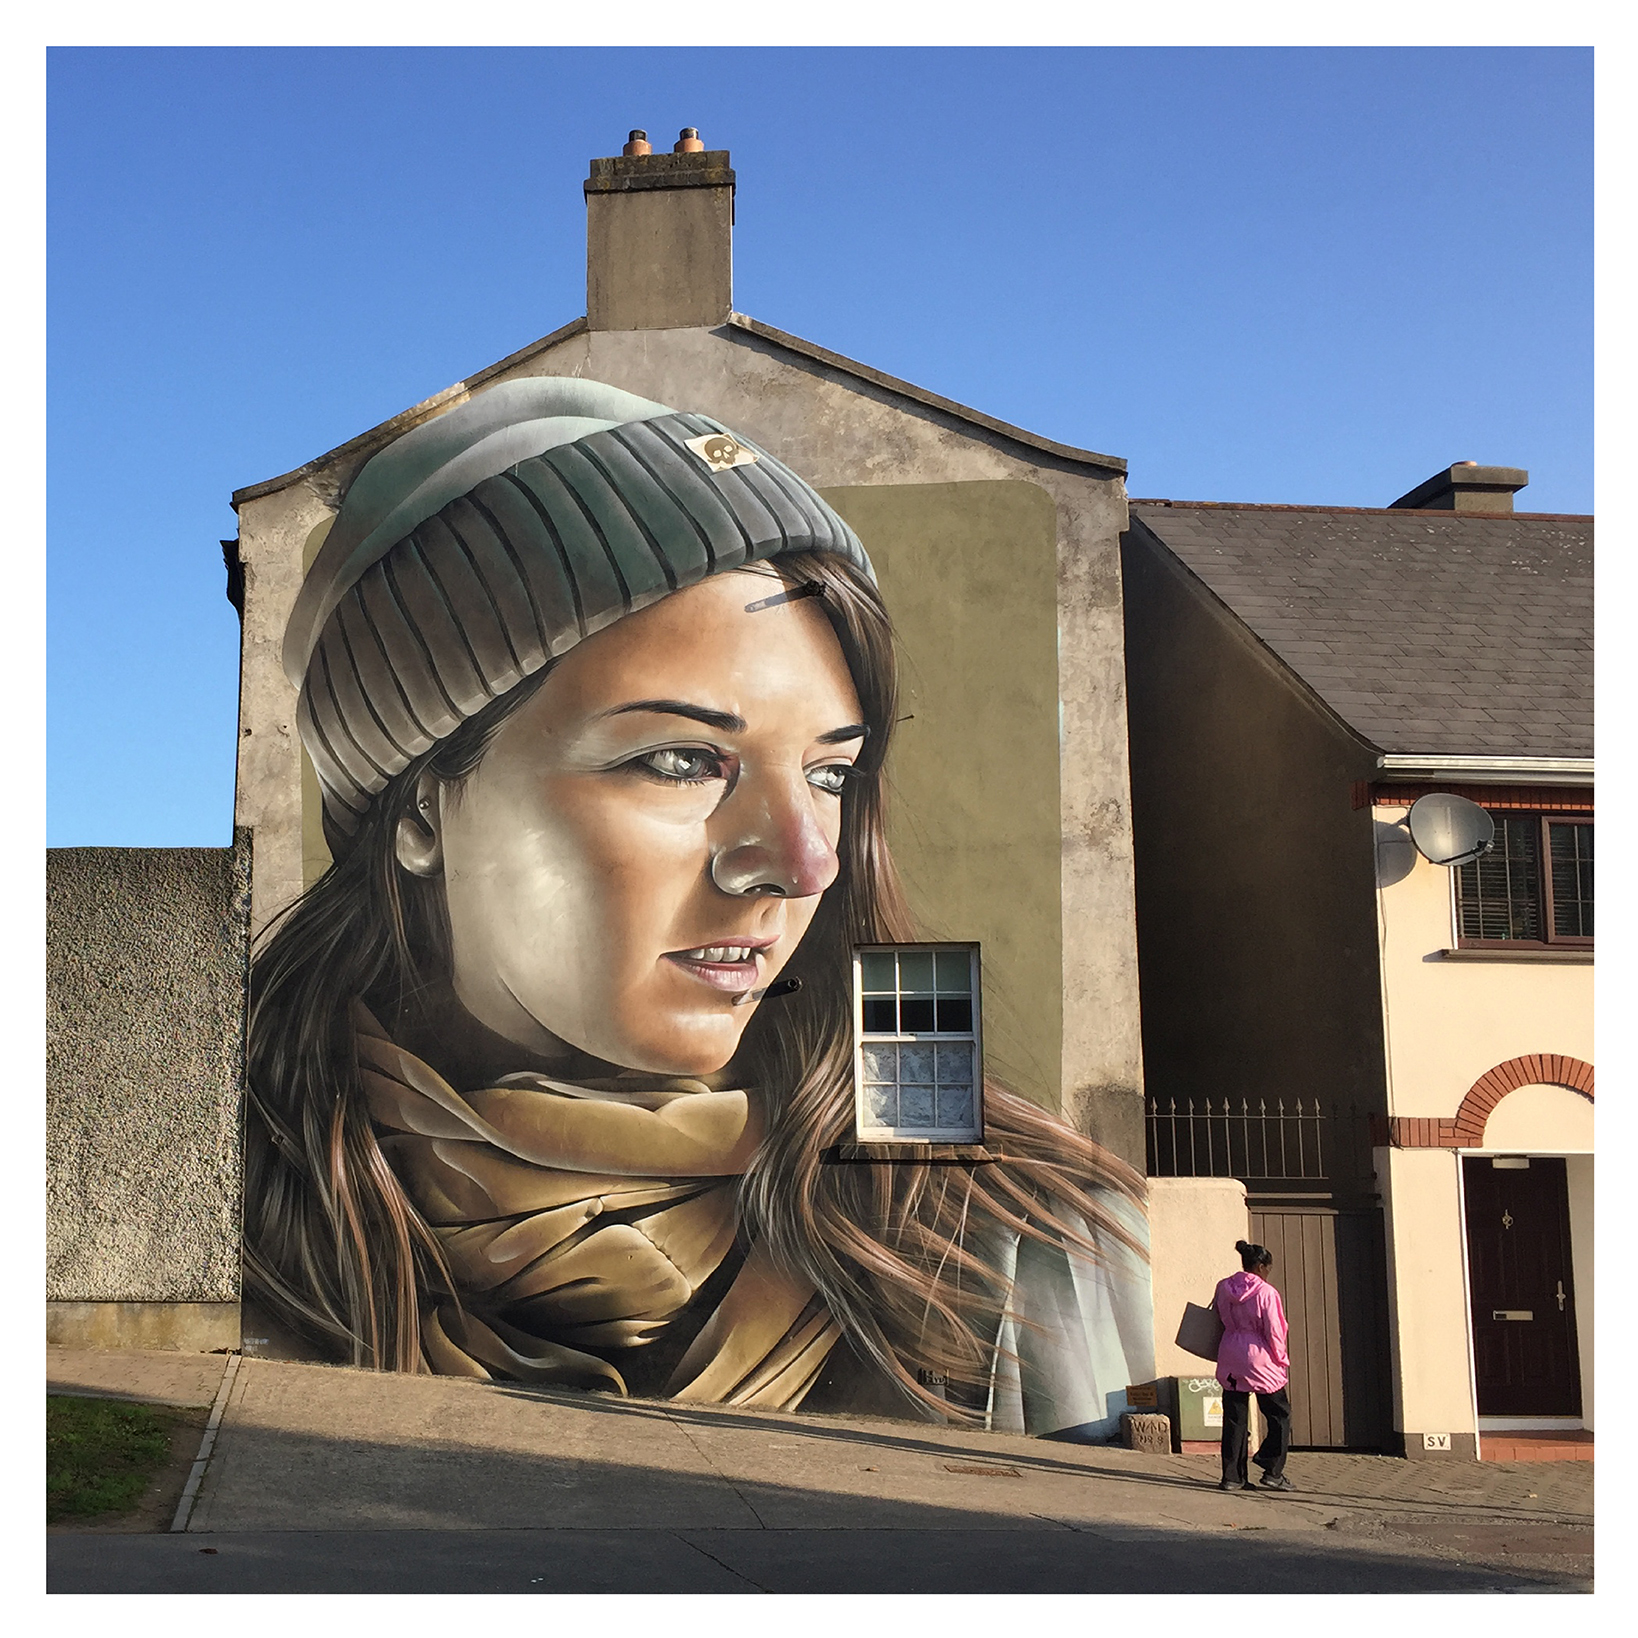 Street Artists transform Waterford City, mural by artist Smug.